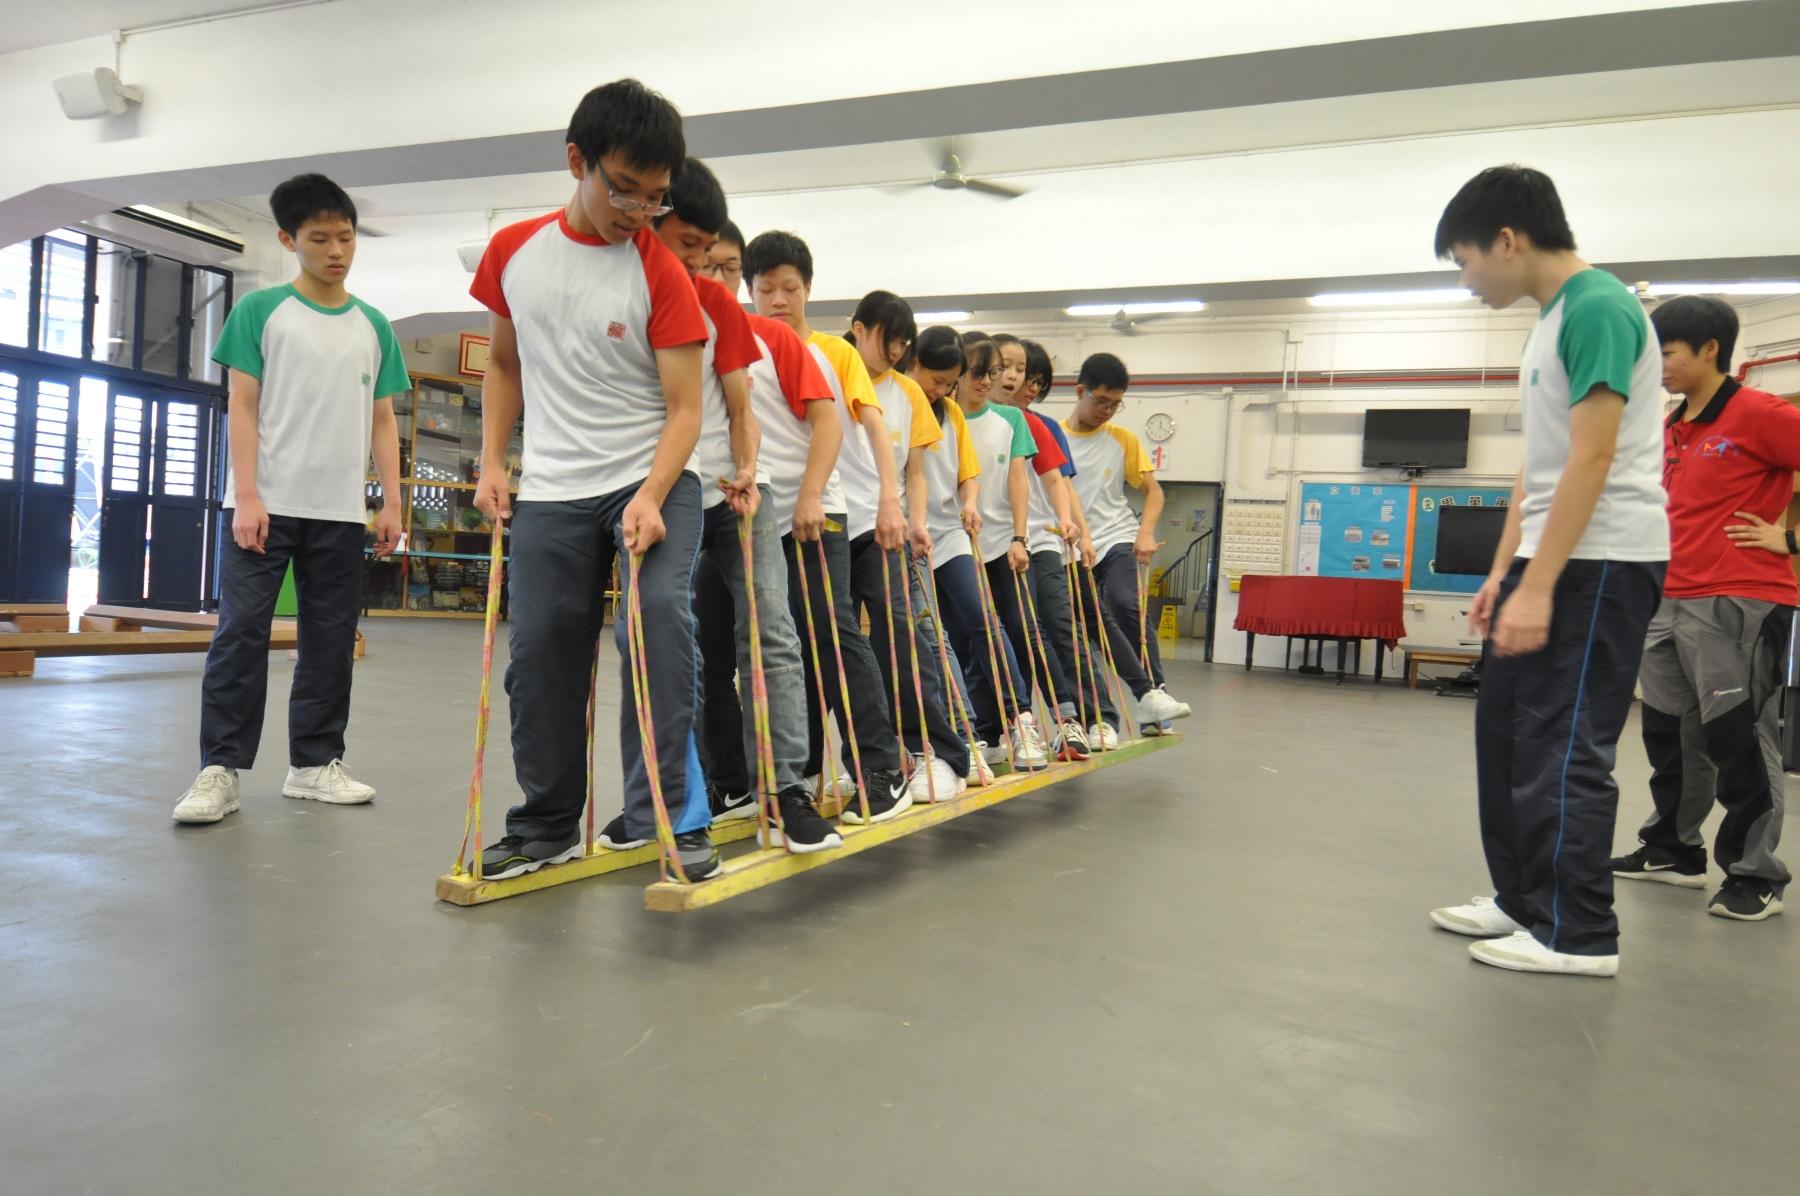 http://npc.edu.hk/sites/default/files/dsc_0334.jpg